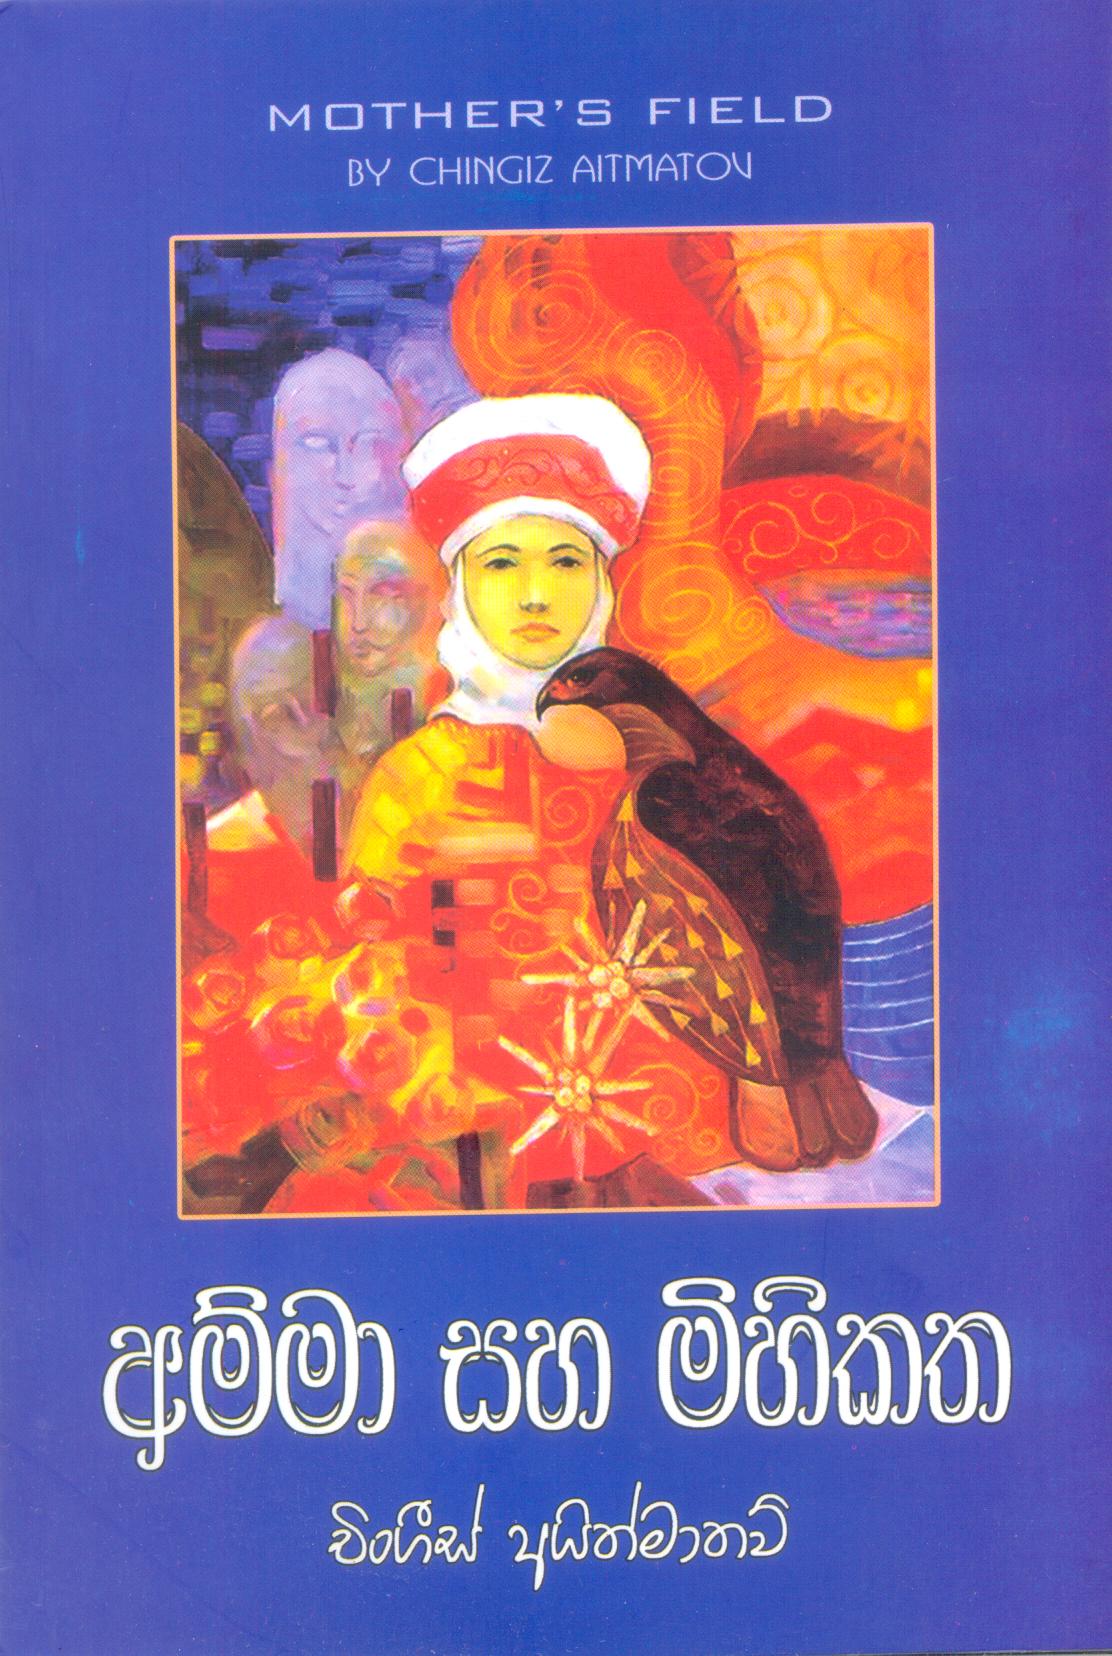 Amma saha Mihikatha